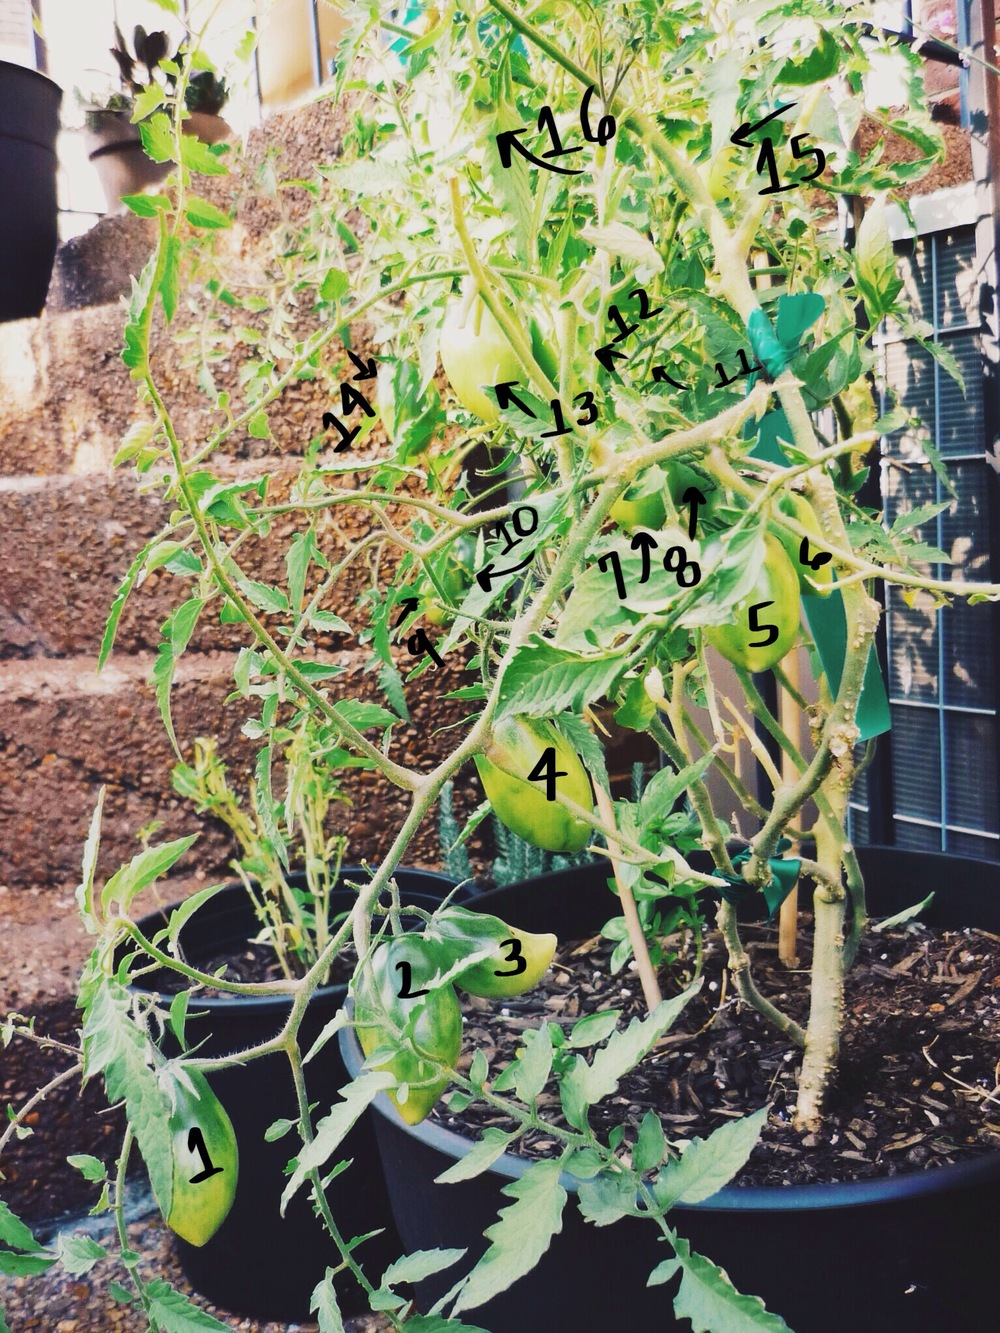 16tomatoes